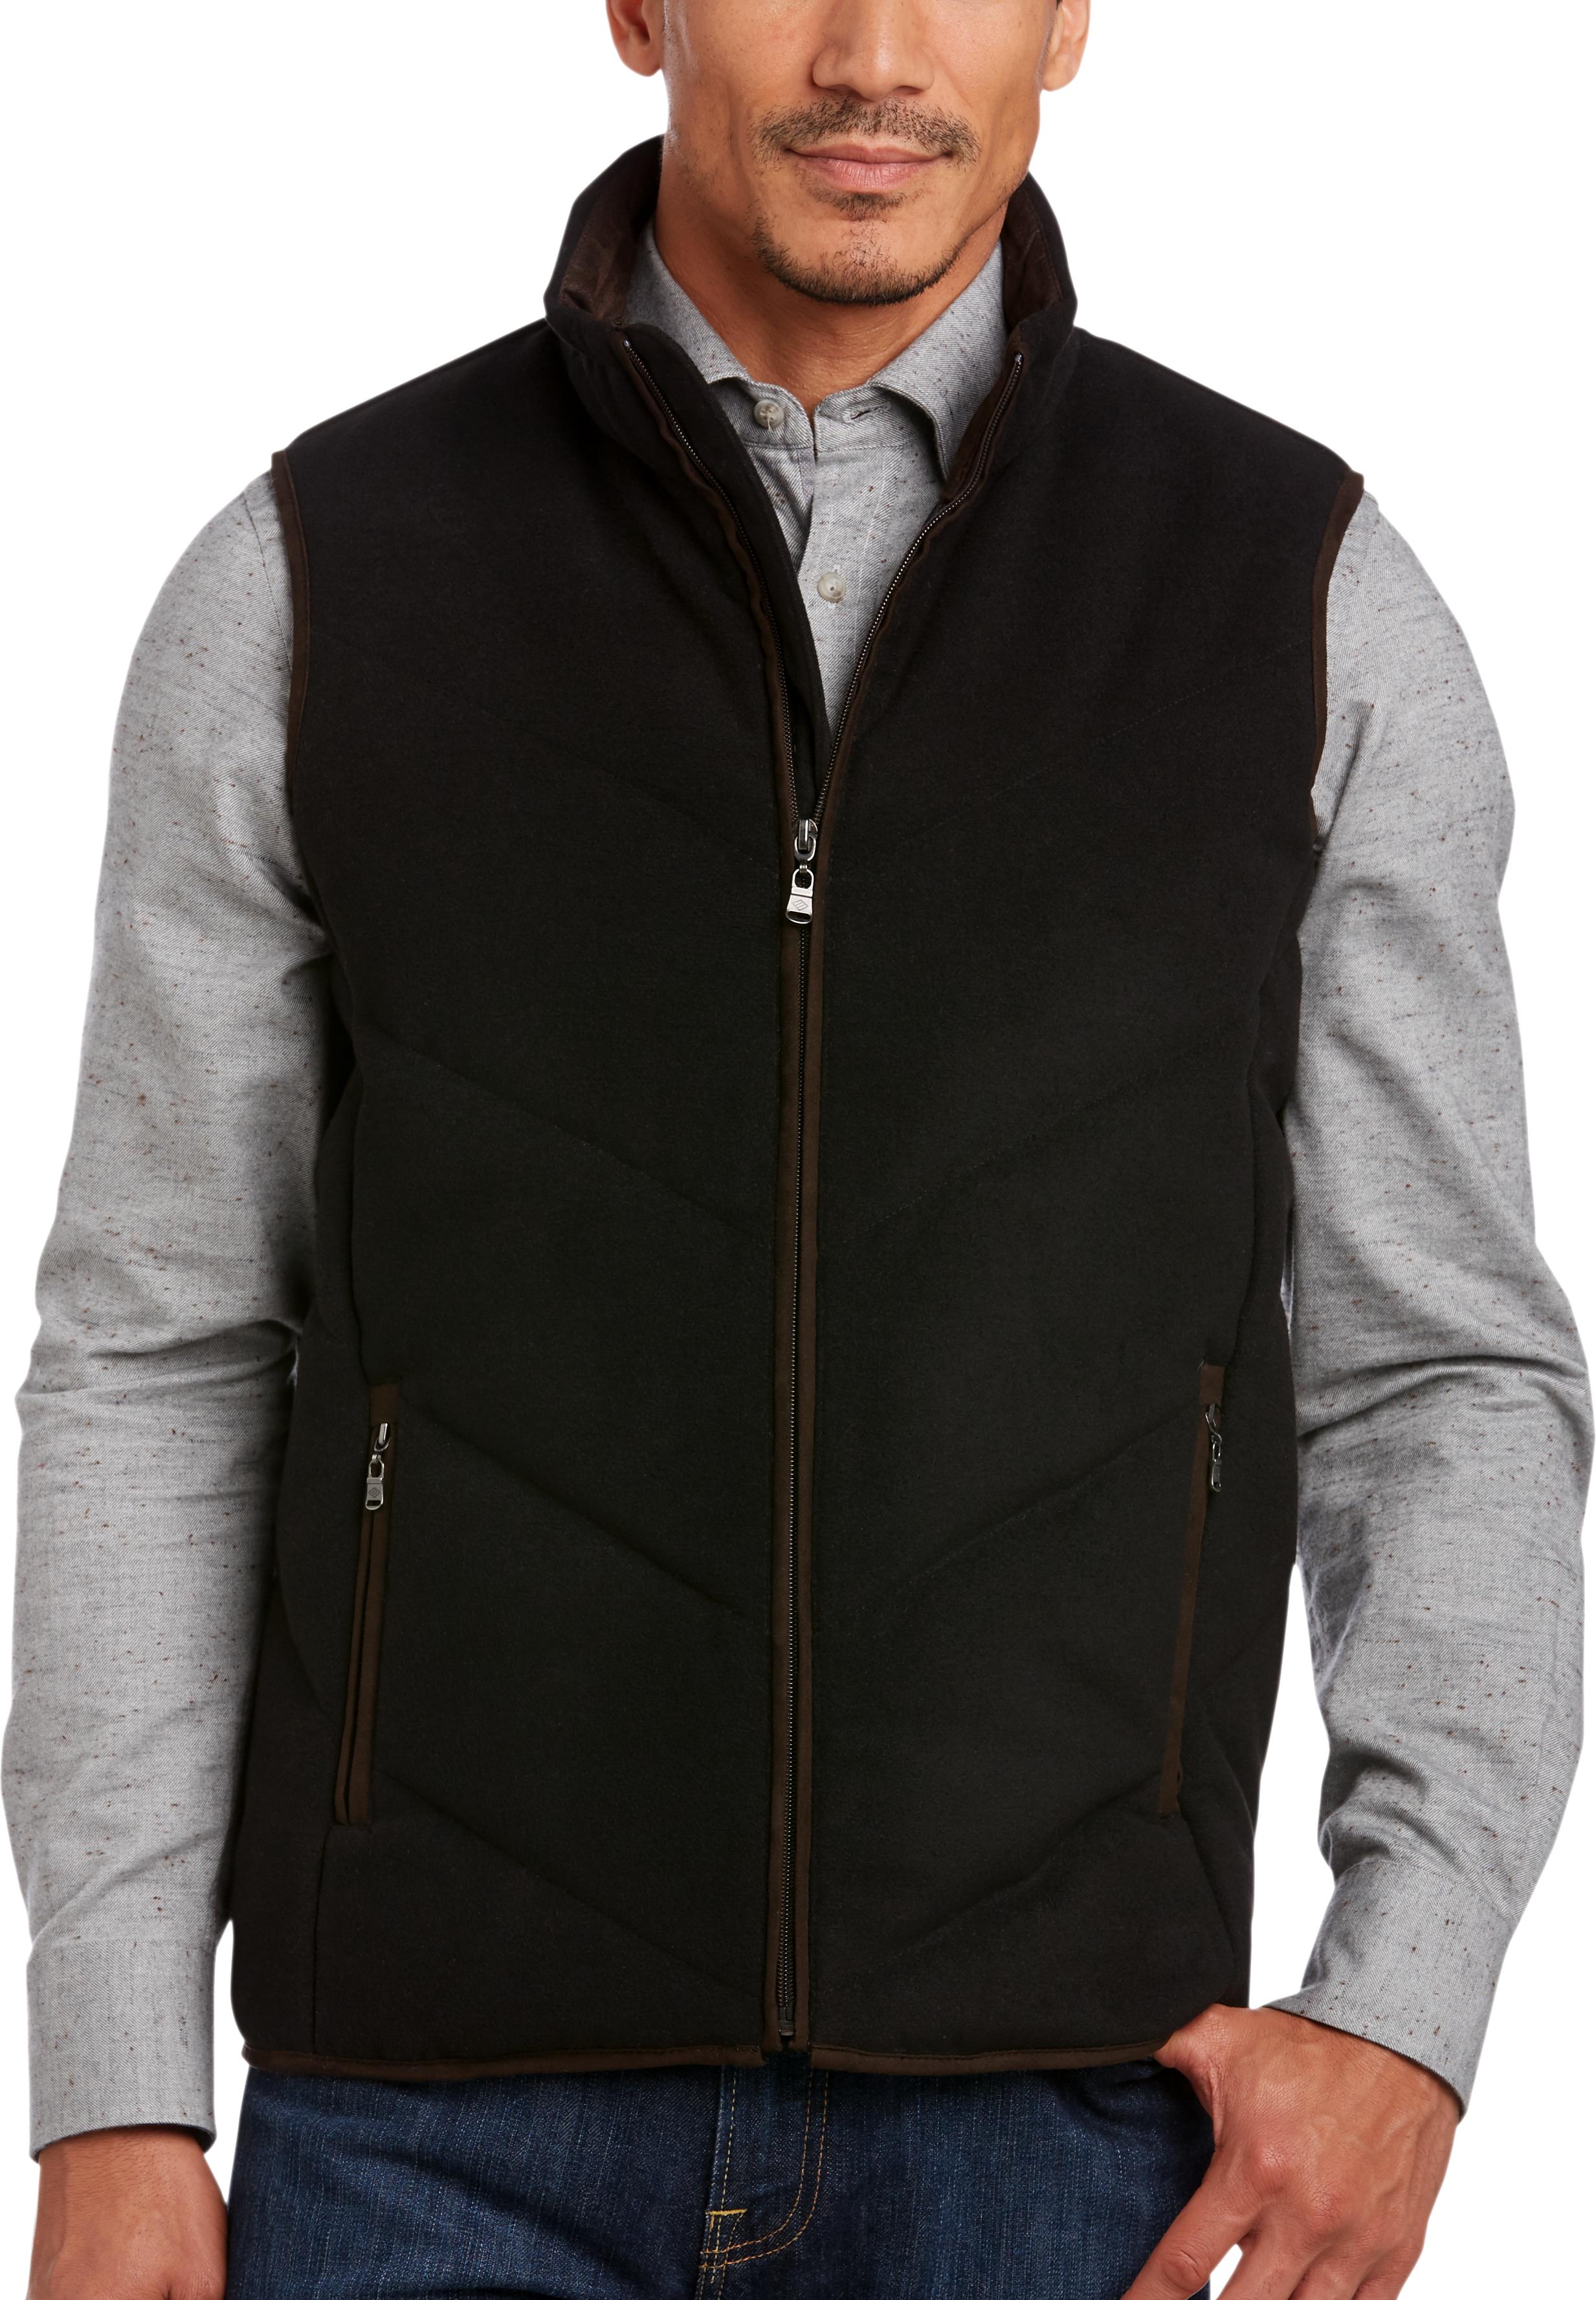 Joseph Abboud Black Modern Fit Vest (Black)